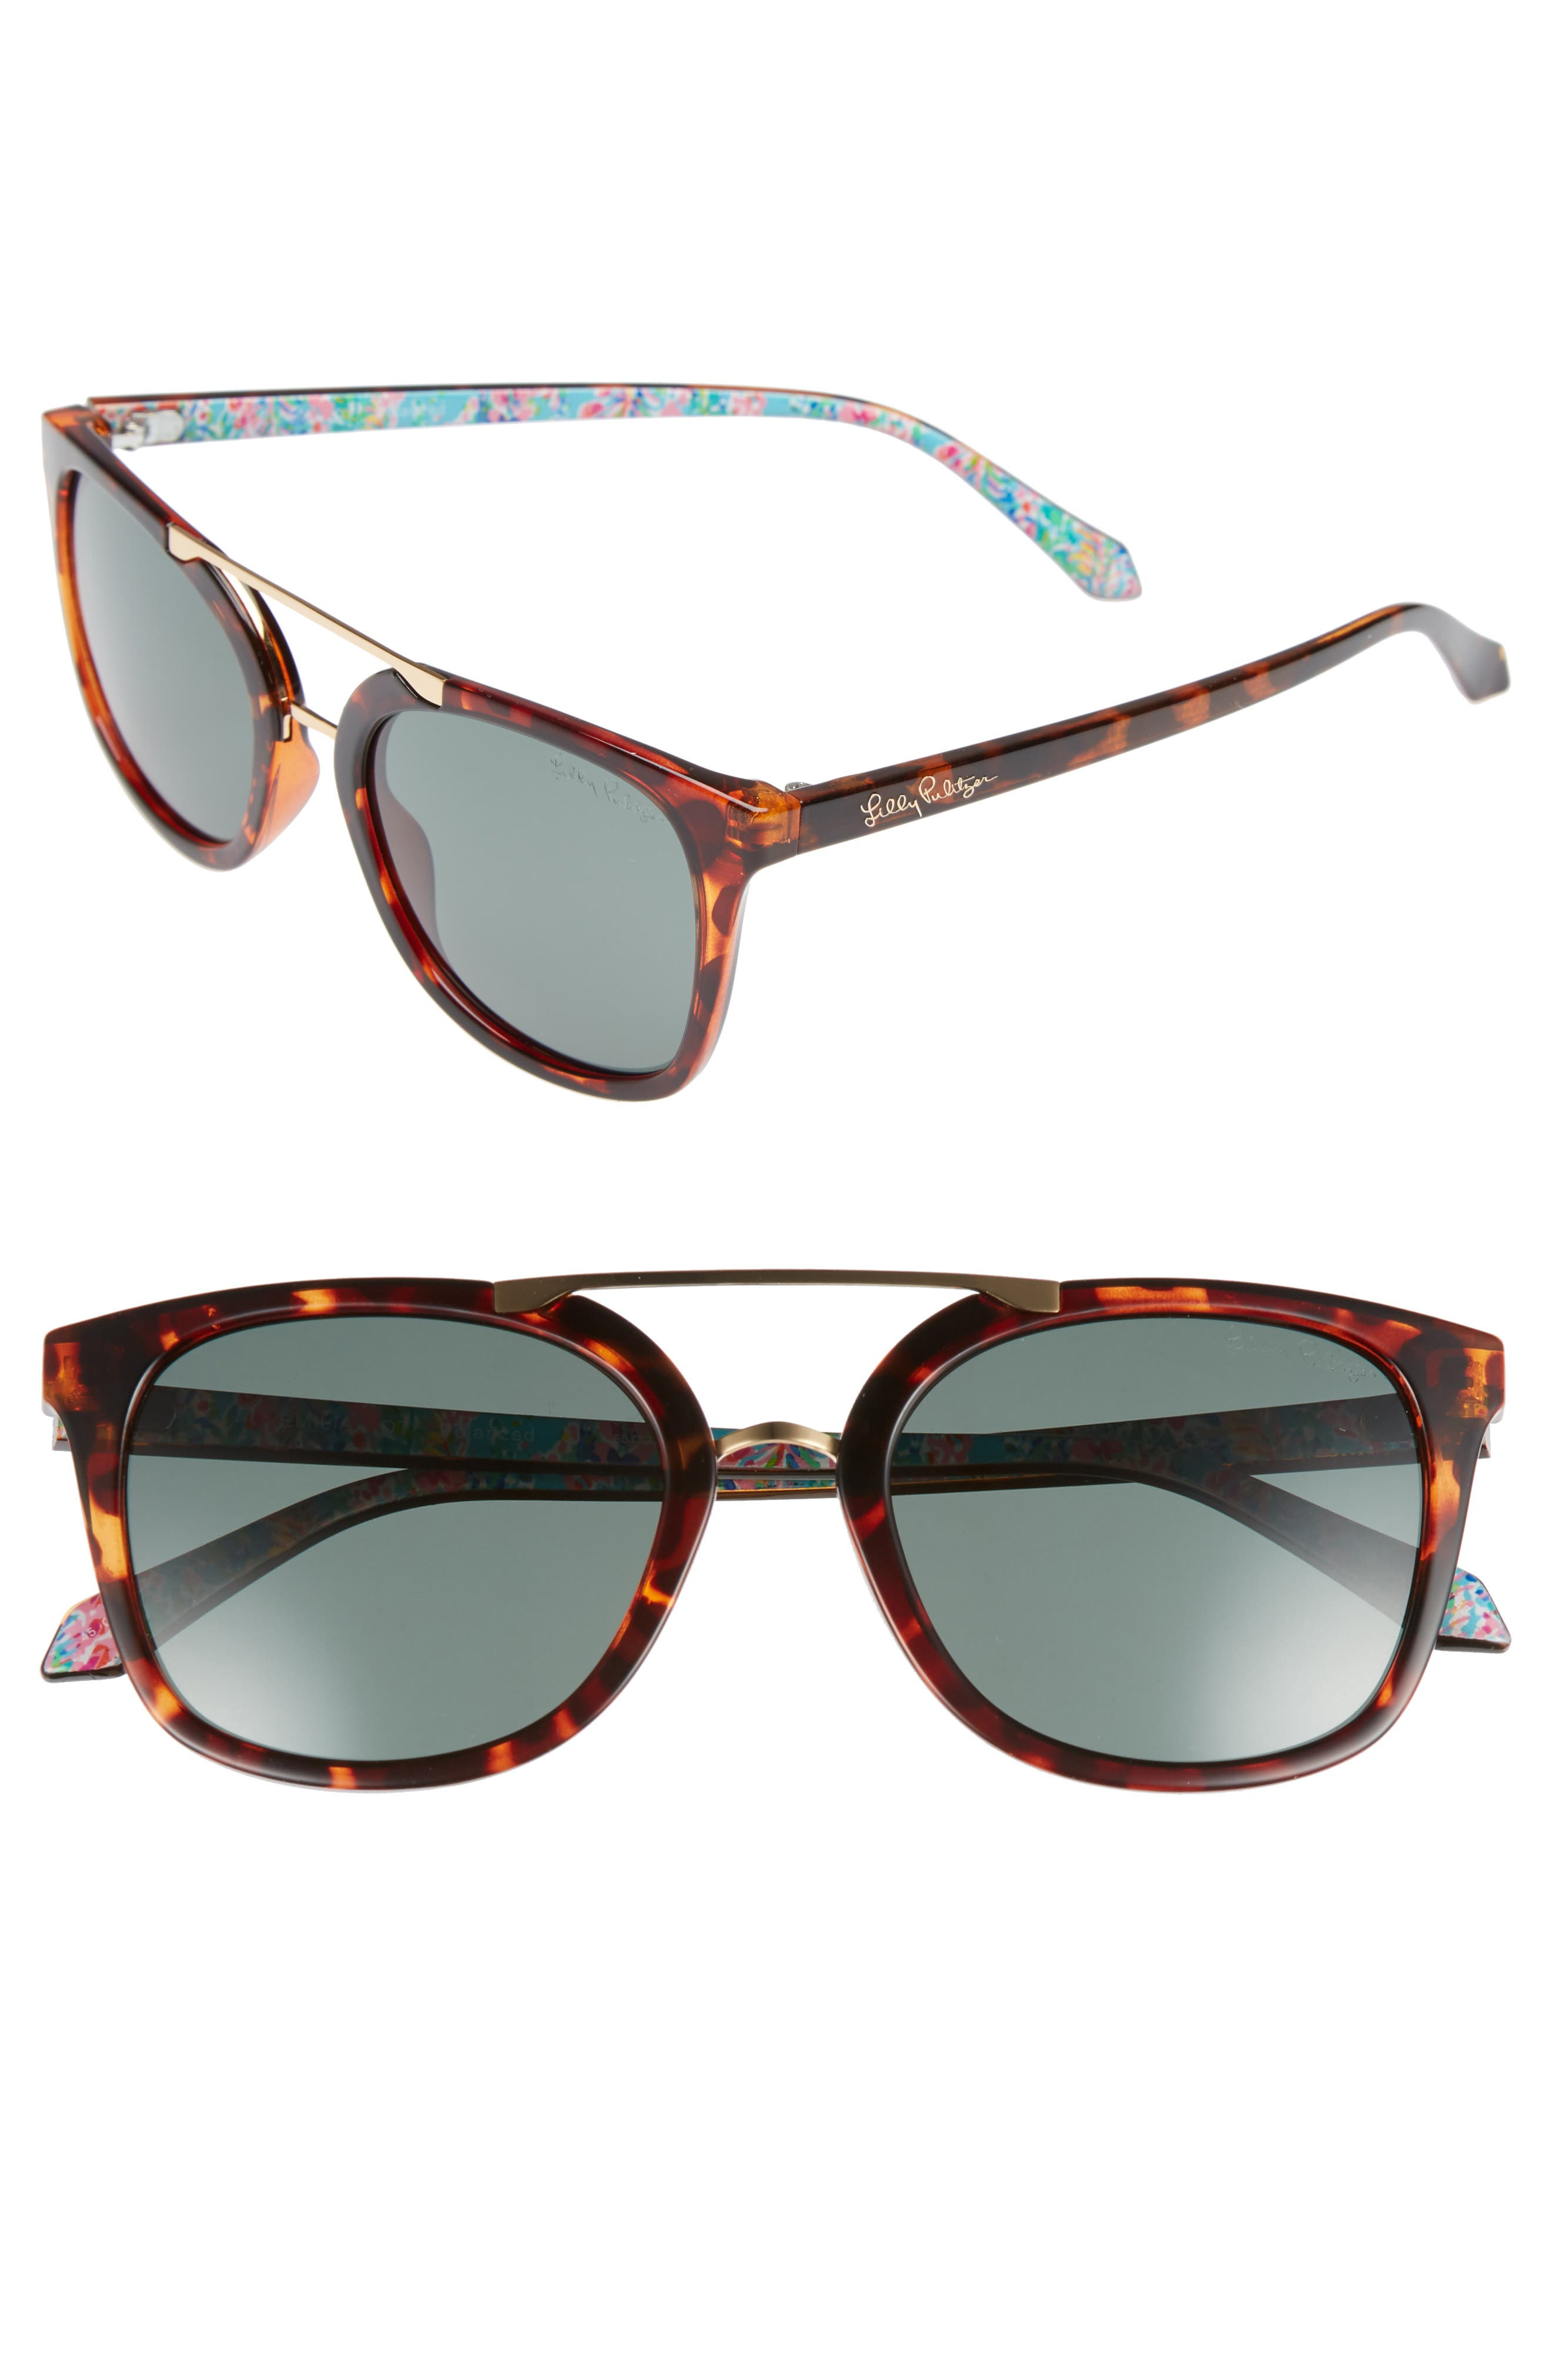 Lilly Pulitzer Emilia 53mm Polarized Sunglasses,                             Main thumbnail 1, color,                             DARK TORTOISE/ GREEN